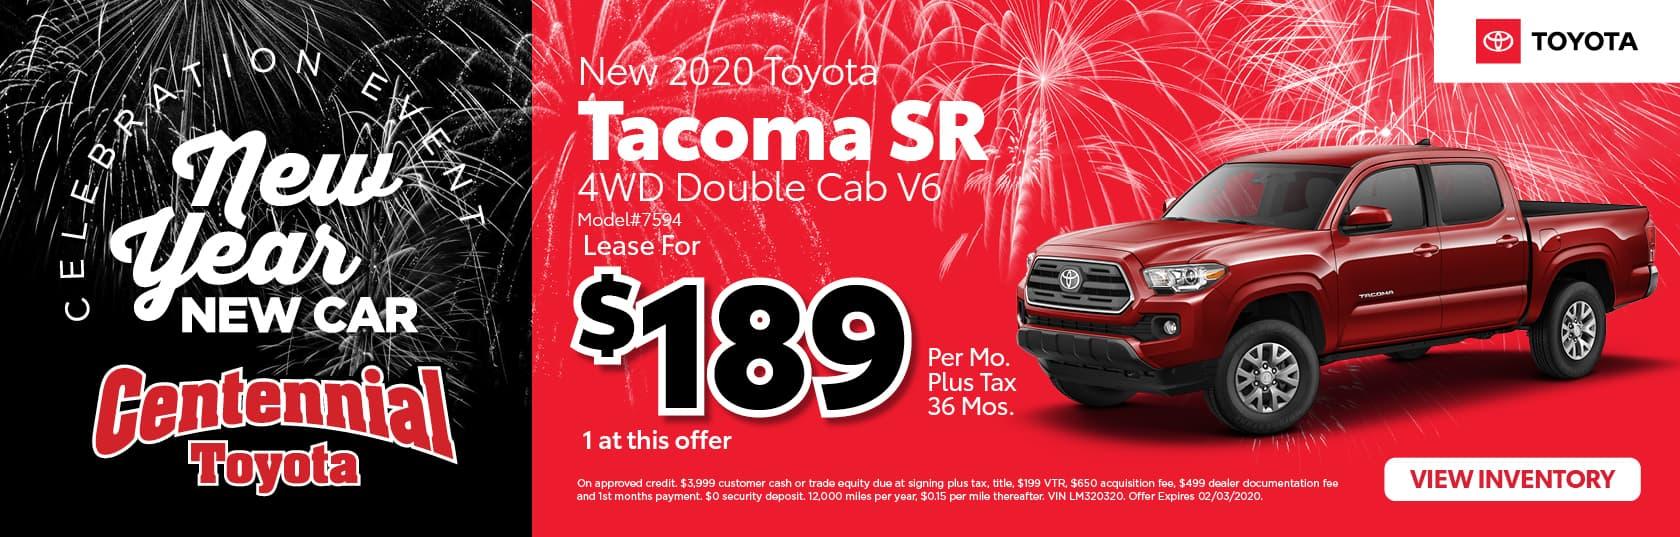 2020 Tacoma SR 4WD